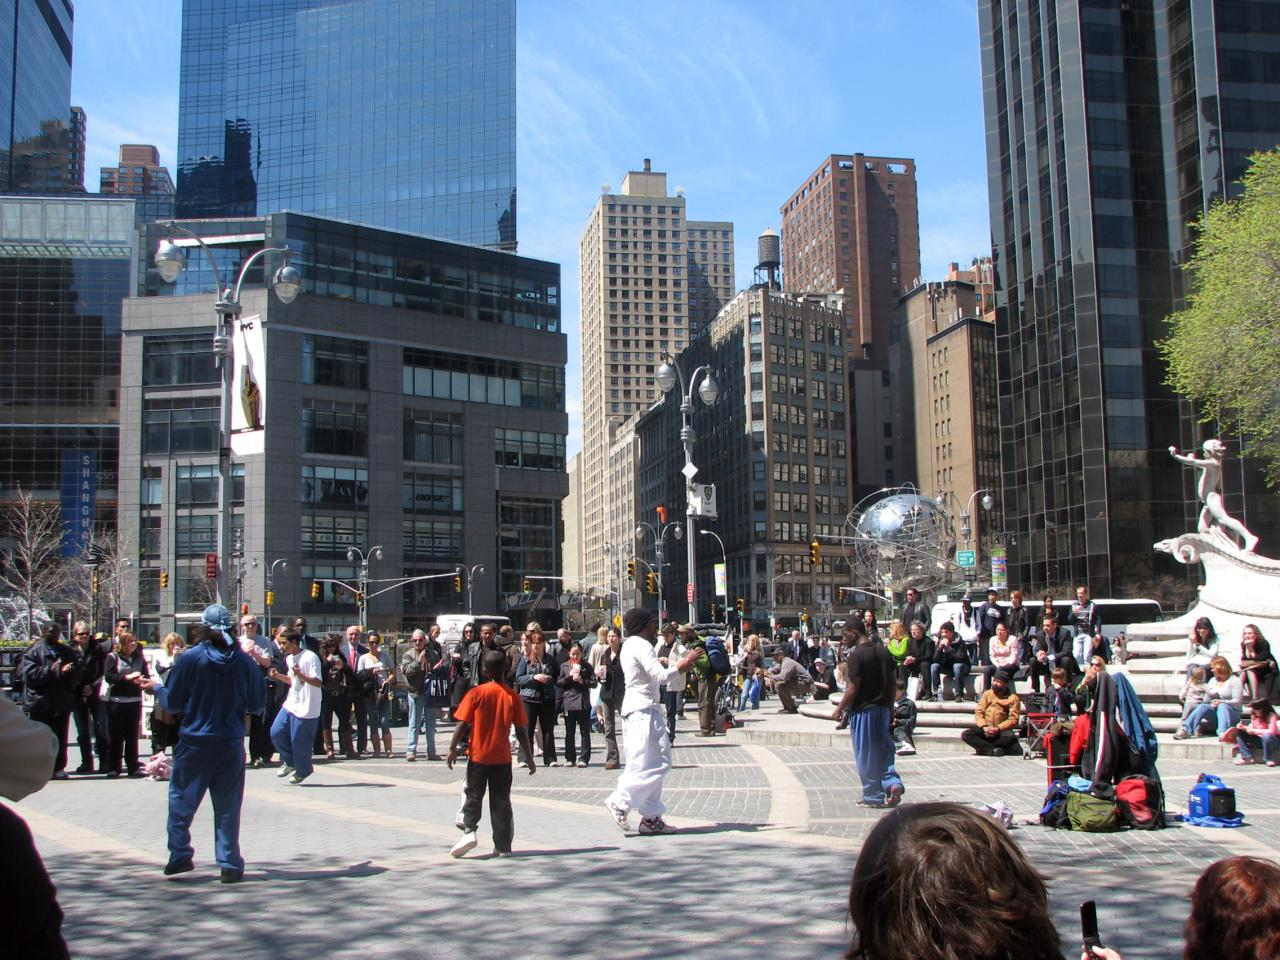 04.16.09 Central Park (6)